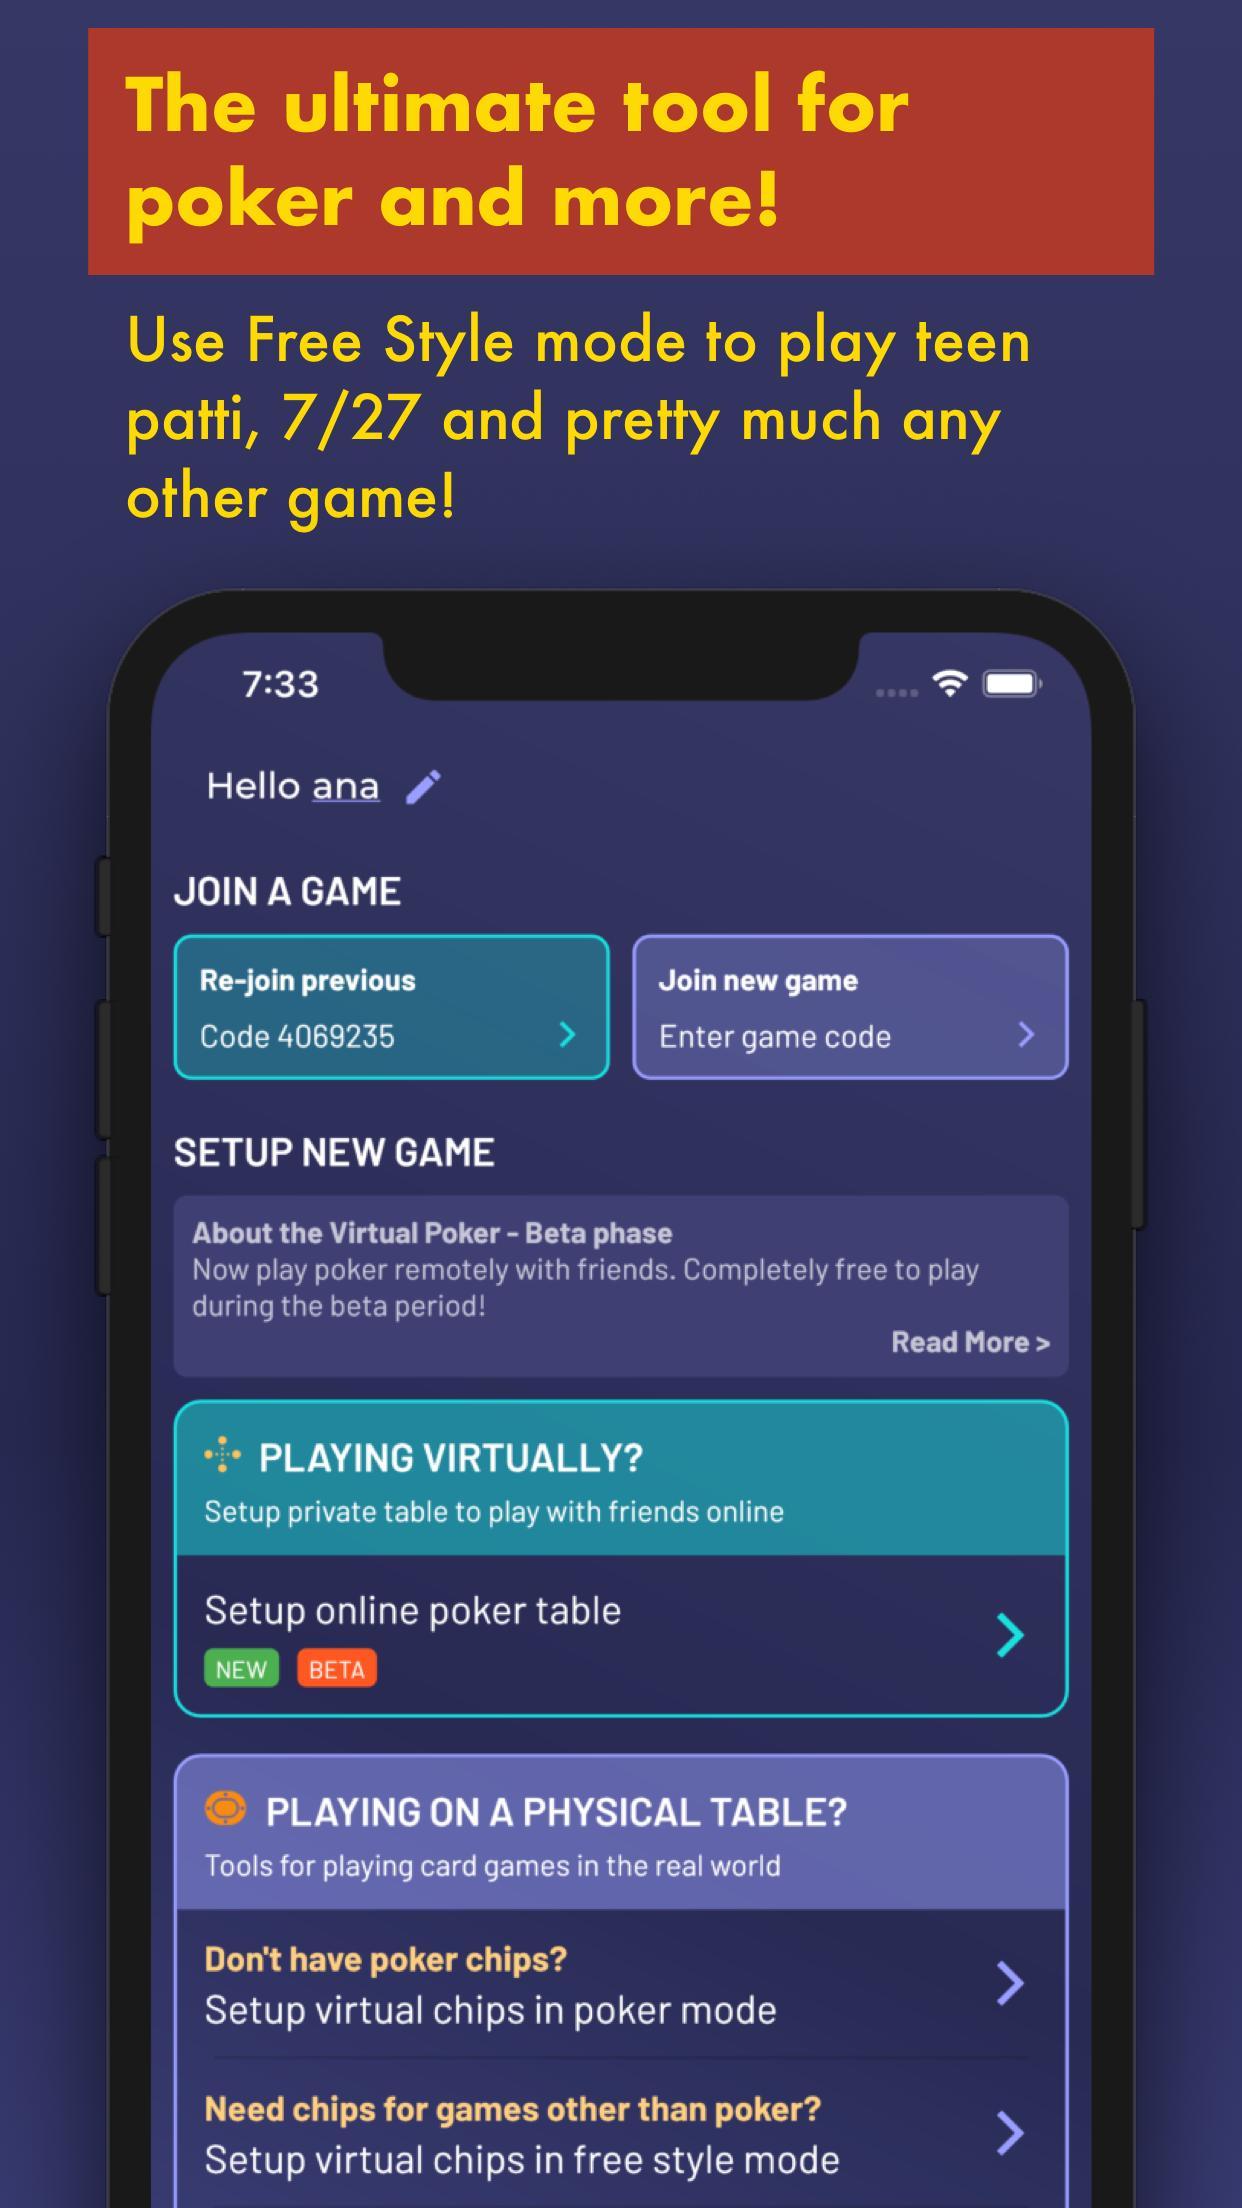 Chips of Fury Virtual Poker Chips, Poker Table 2.0.6 Screenshot 3